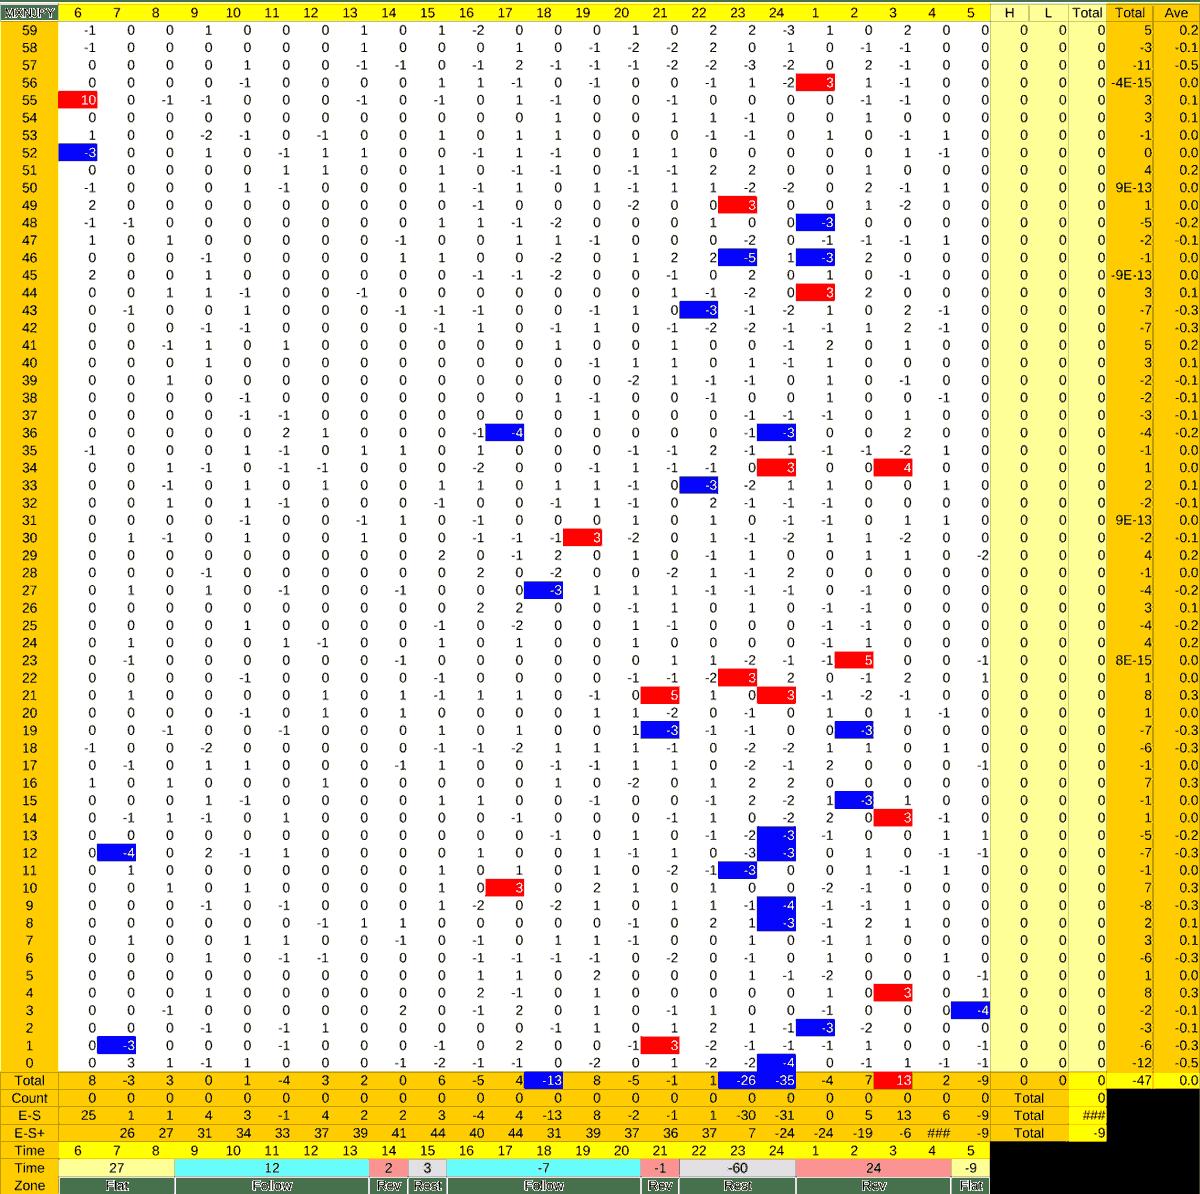 20210611_HS(3)MXNJPY